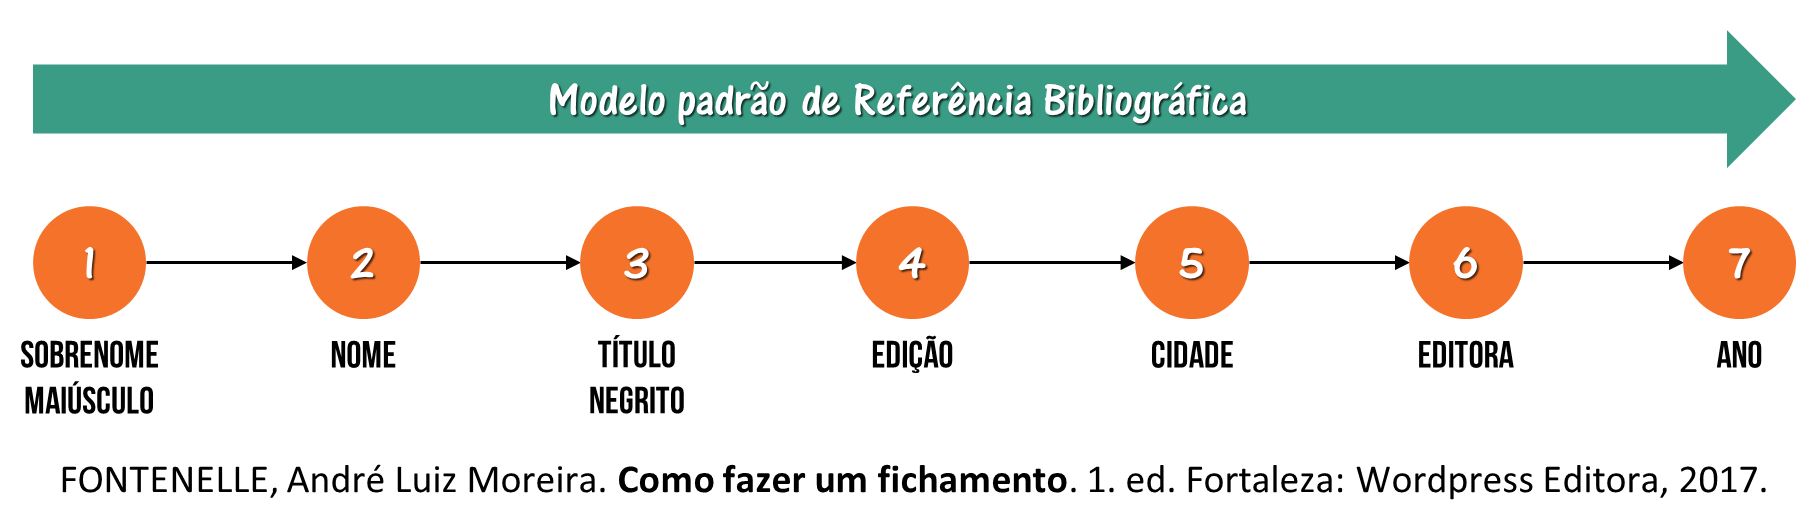 Referência Bibliográfica - Modelo